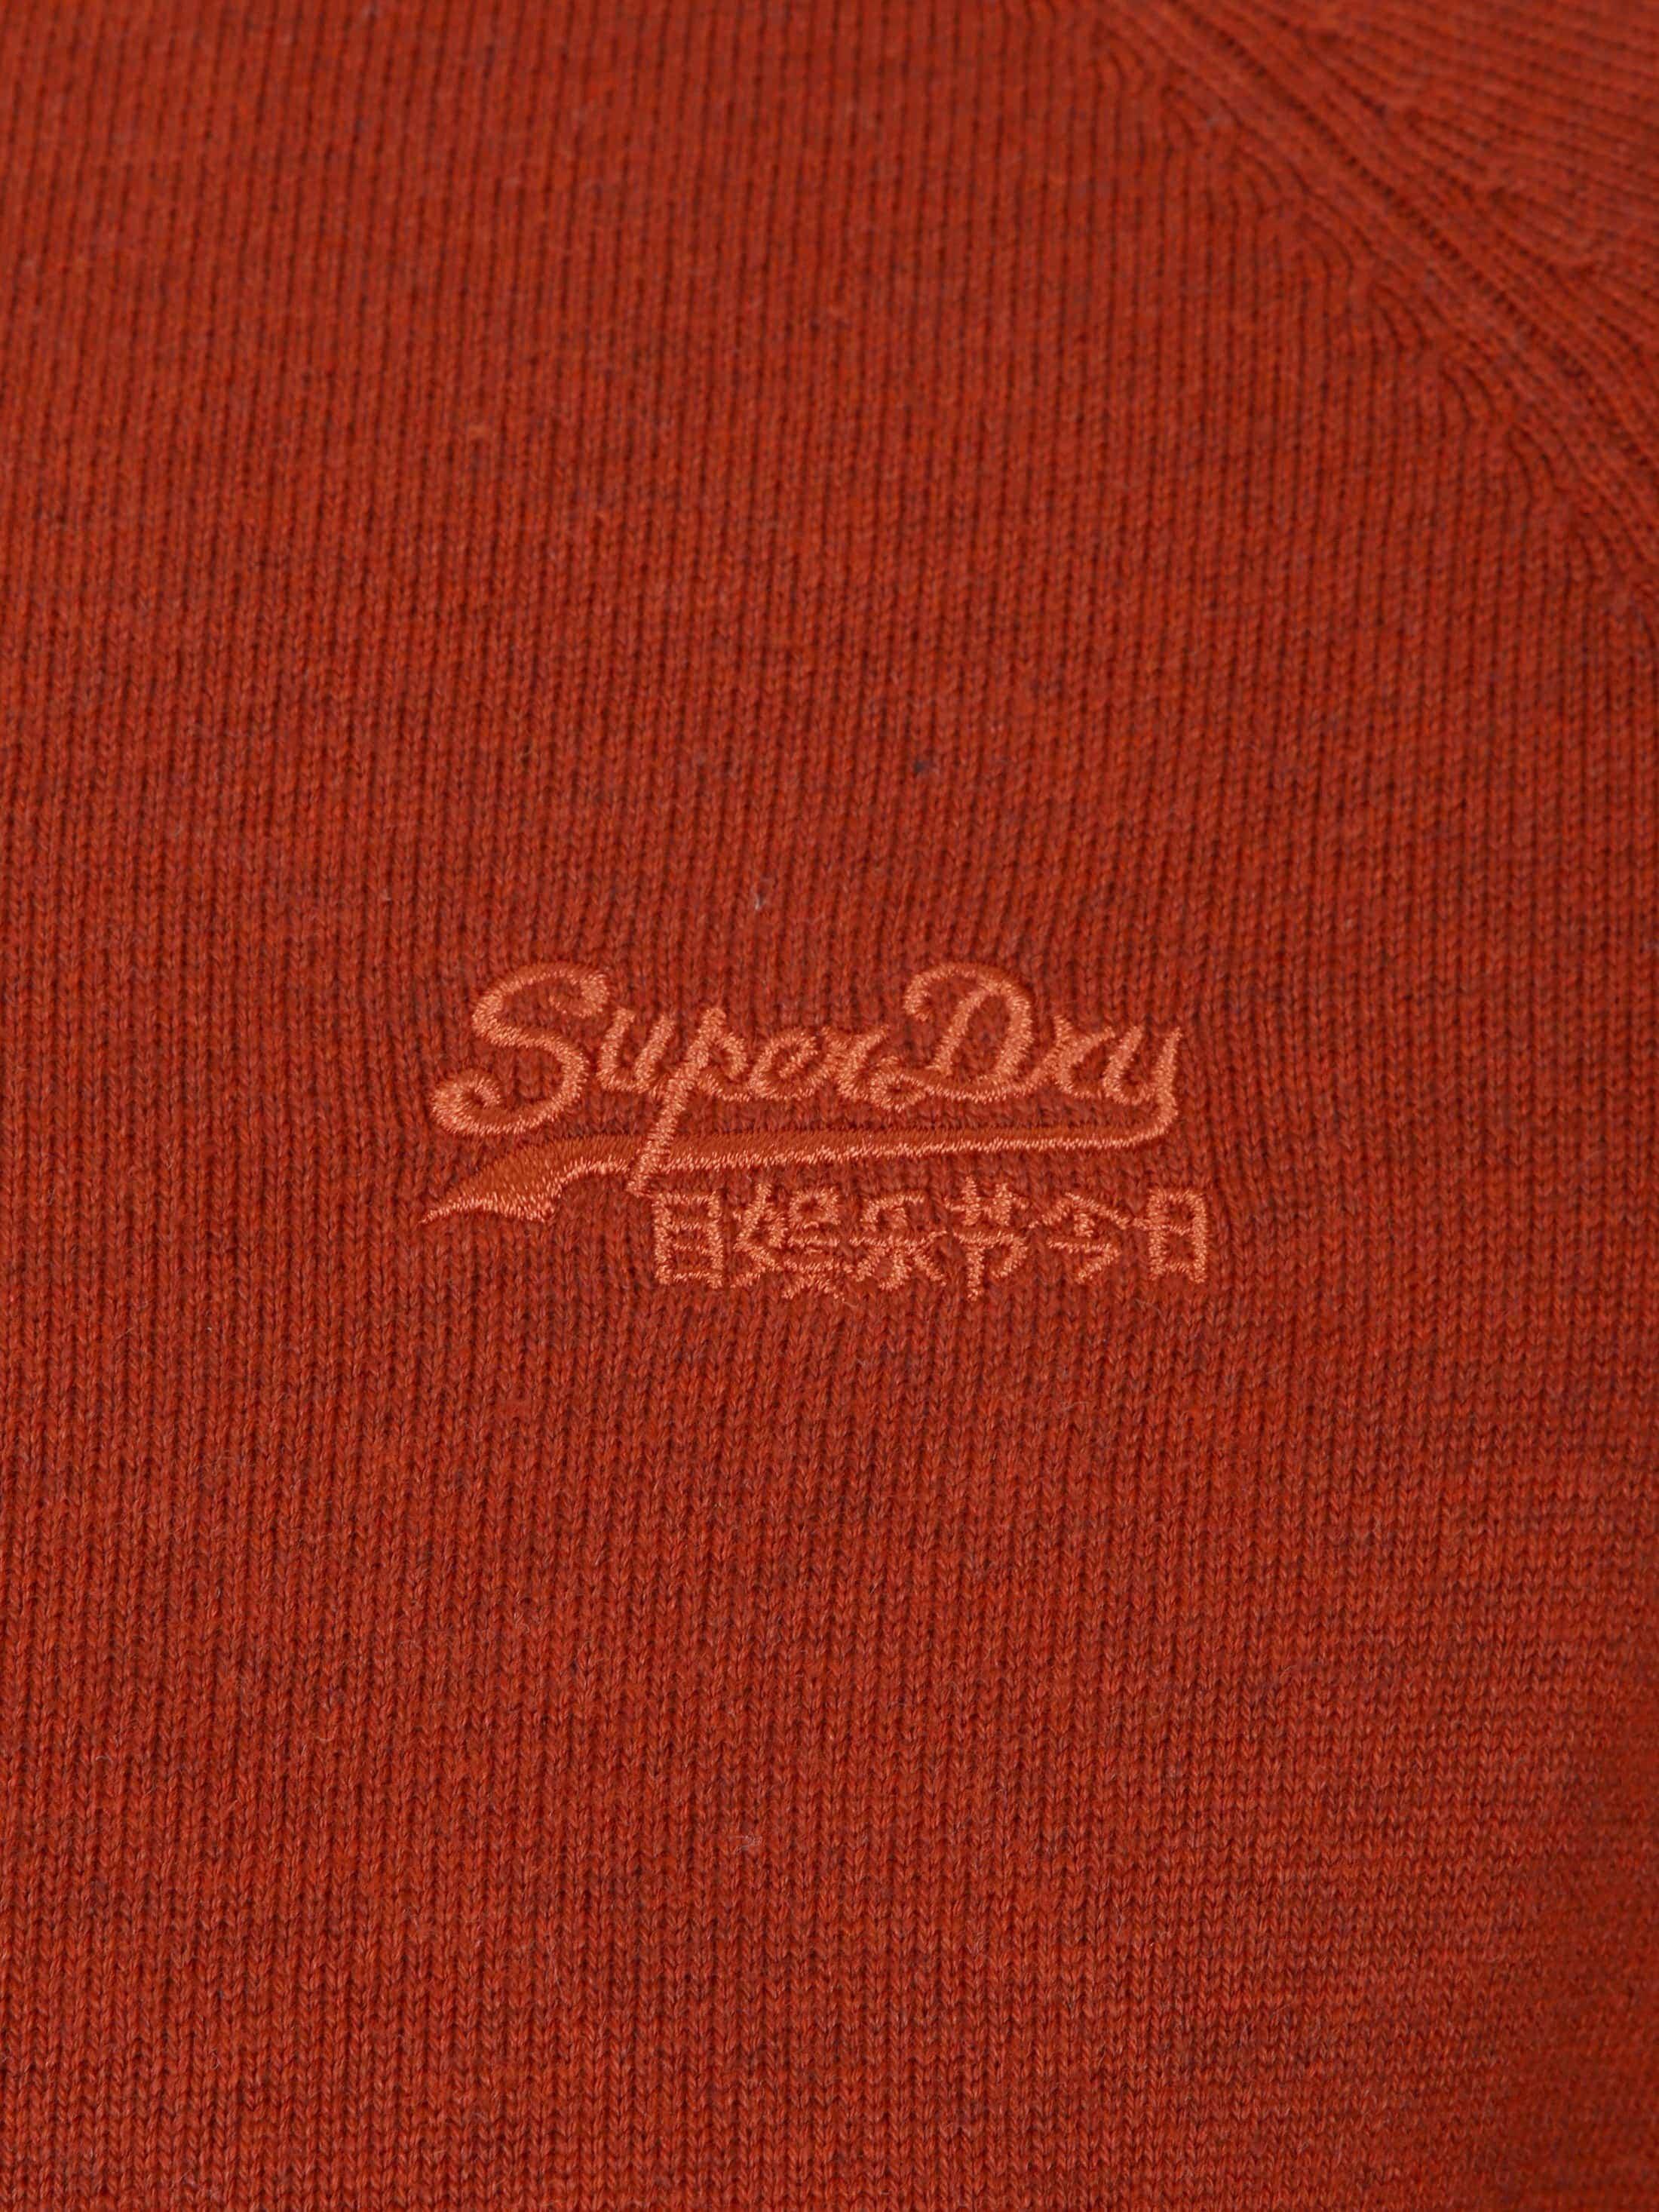 Superdry Sweater Melange Red Orange foto 1